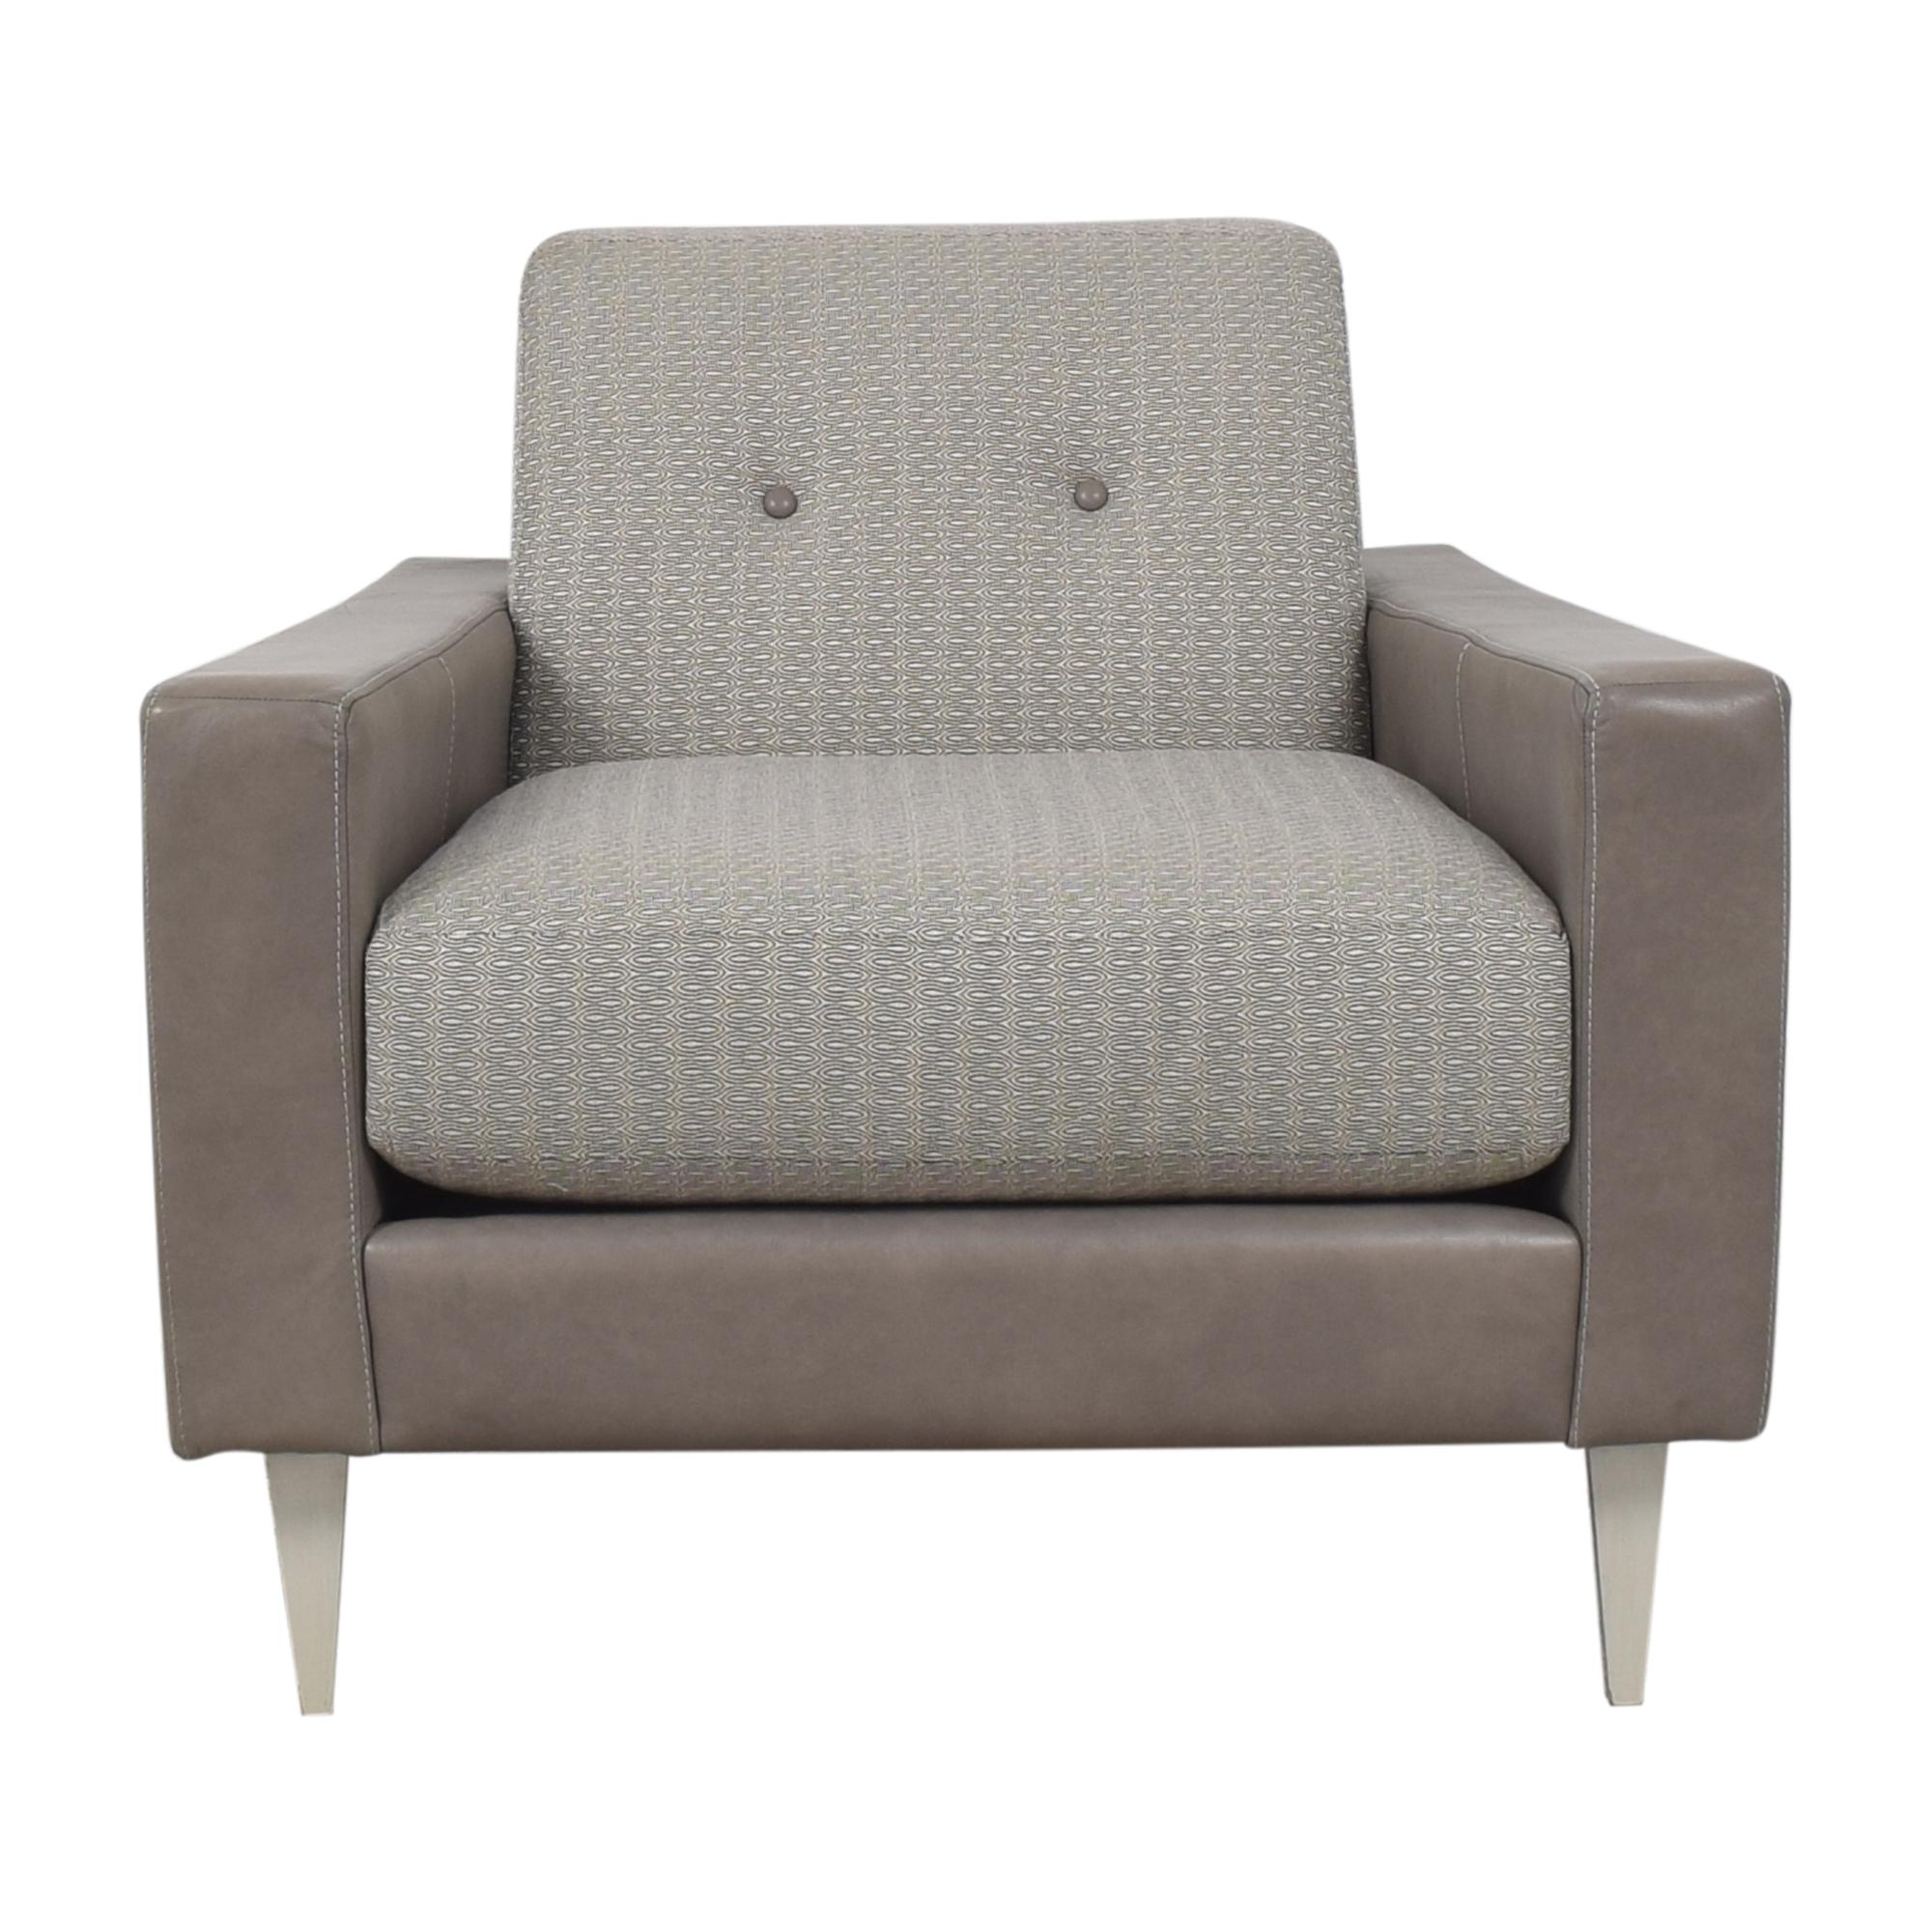 Lazar Lazar Flamingo Chair for sale